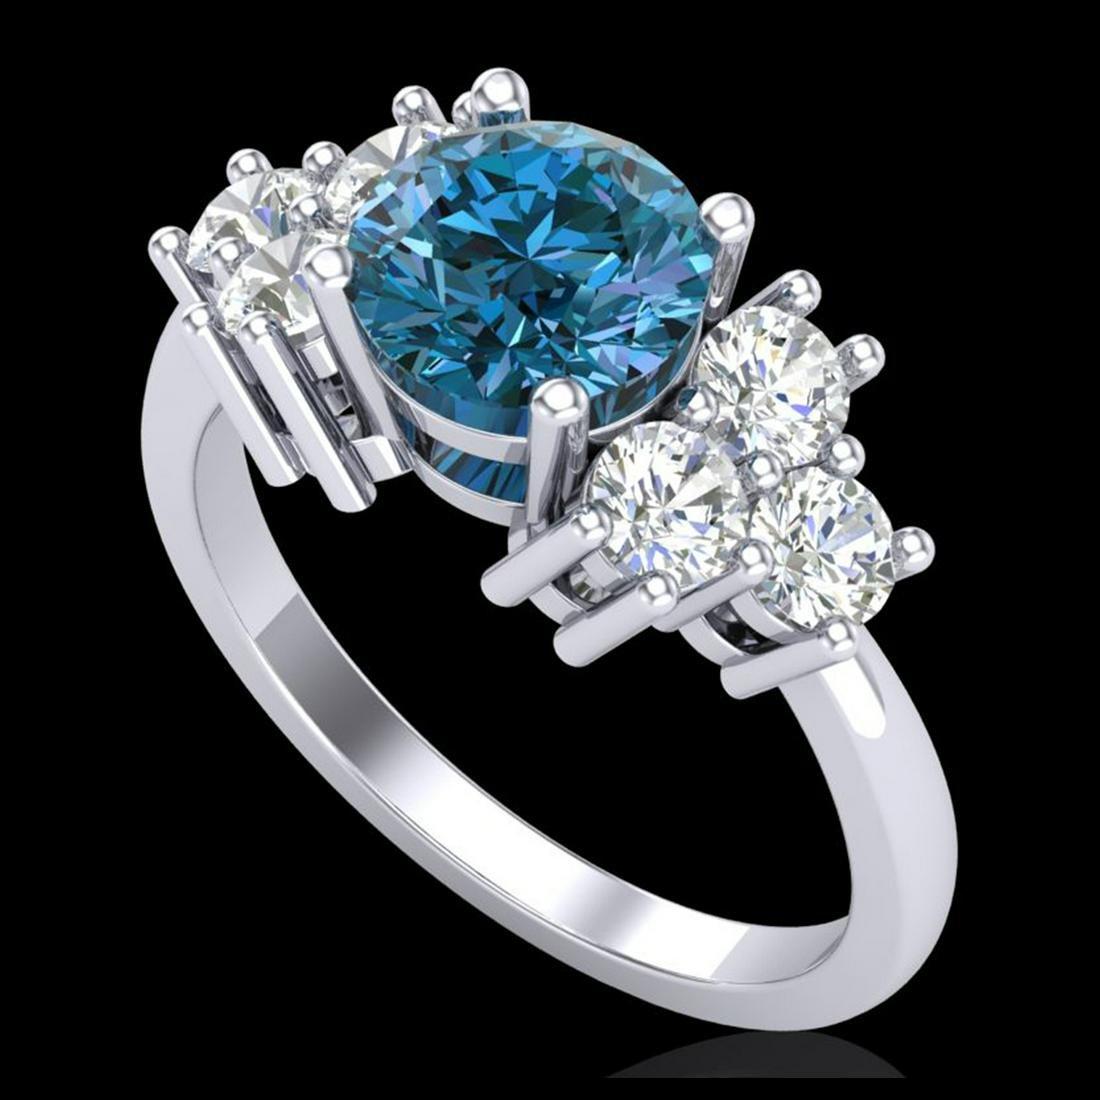 1.51 ctw Fancy Intense Blue Diamond Art Deco Ring 18K